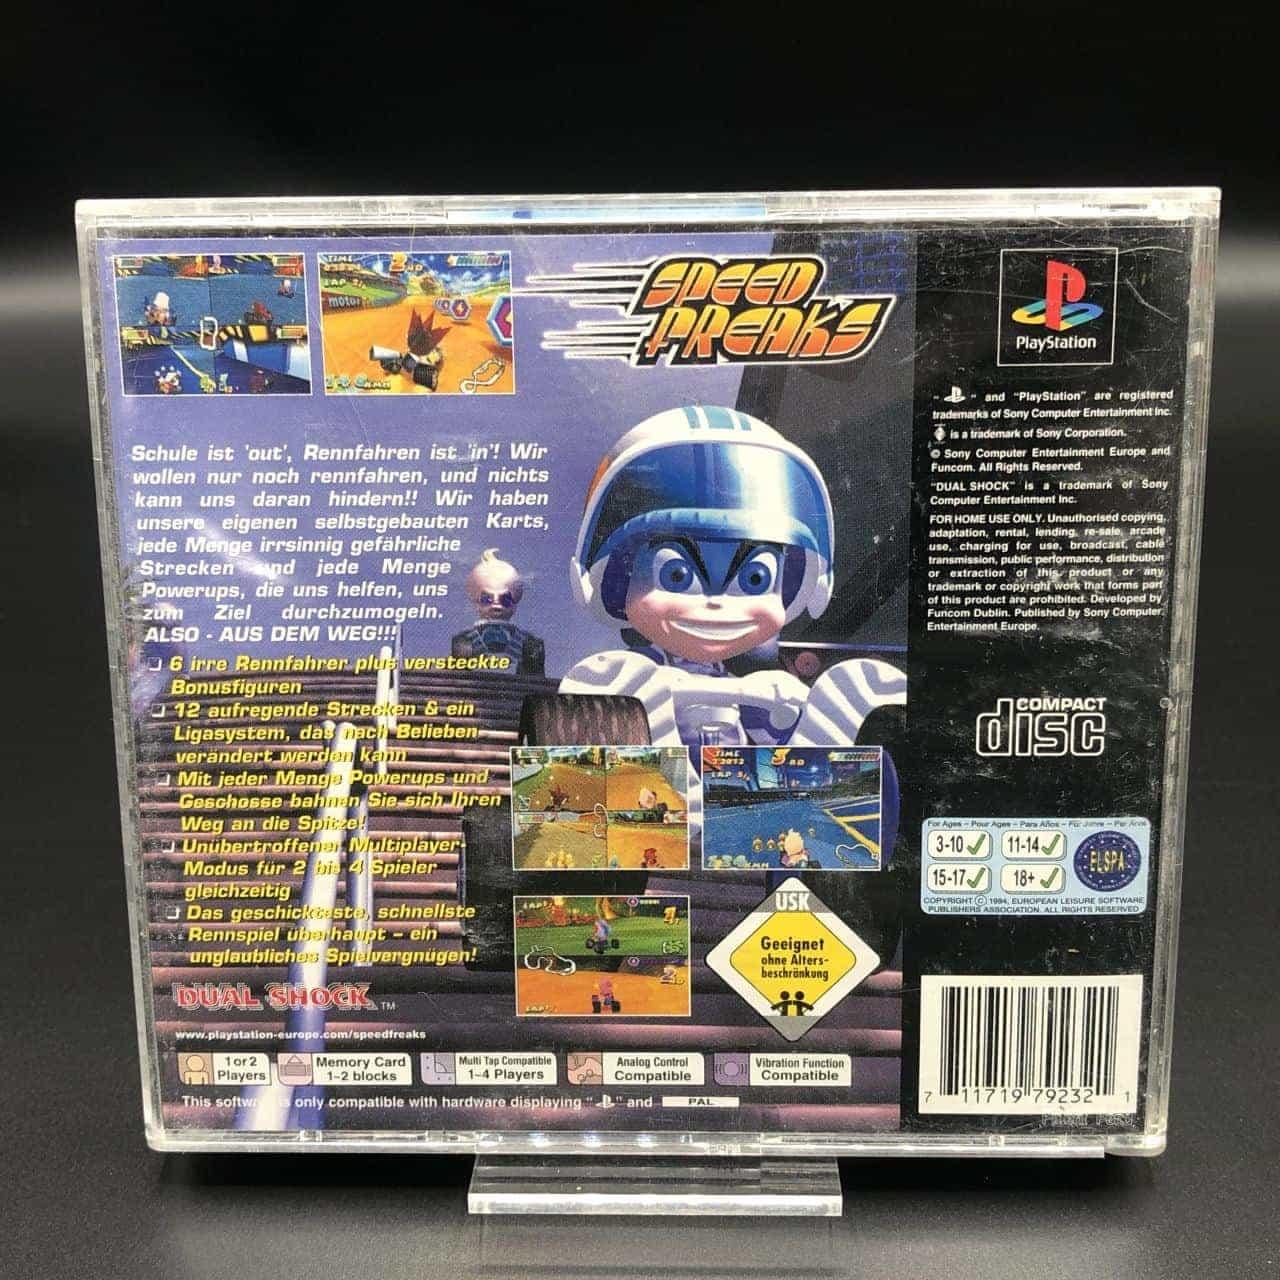 PS1 Speed Freaks (Komplett) (Gebrauchsspuren) Sony PlayStation 1